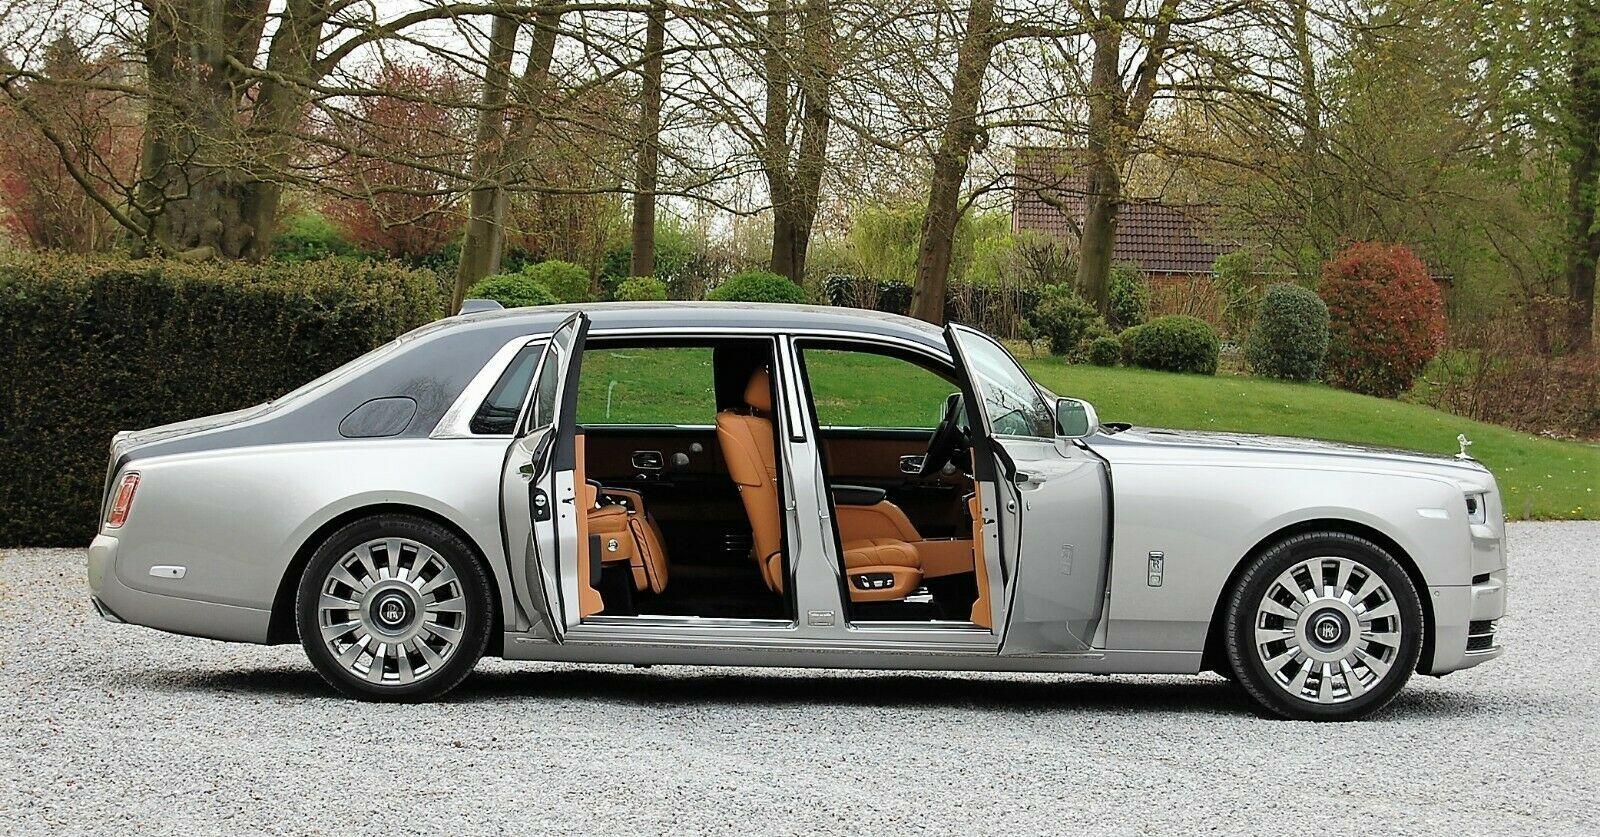 Rolls Royce Phantom Ewb Nv Ginion Overijse Belgium For Sale On Luxurypulse Rolls Royce Phantom Rolls Royce Luxury Cars Rolls Royce